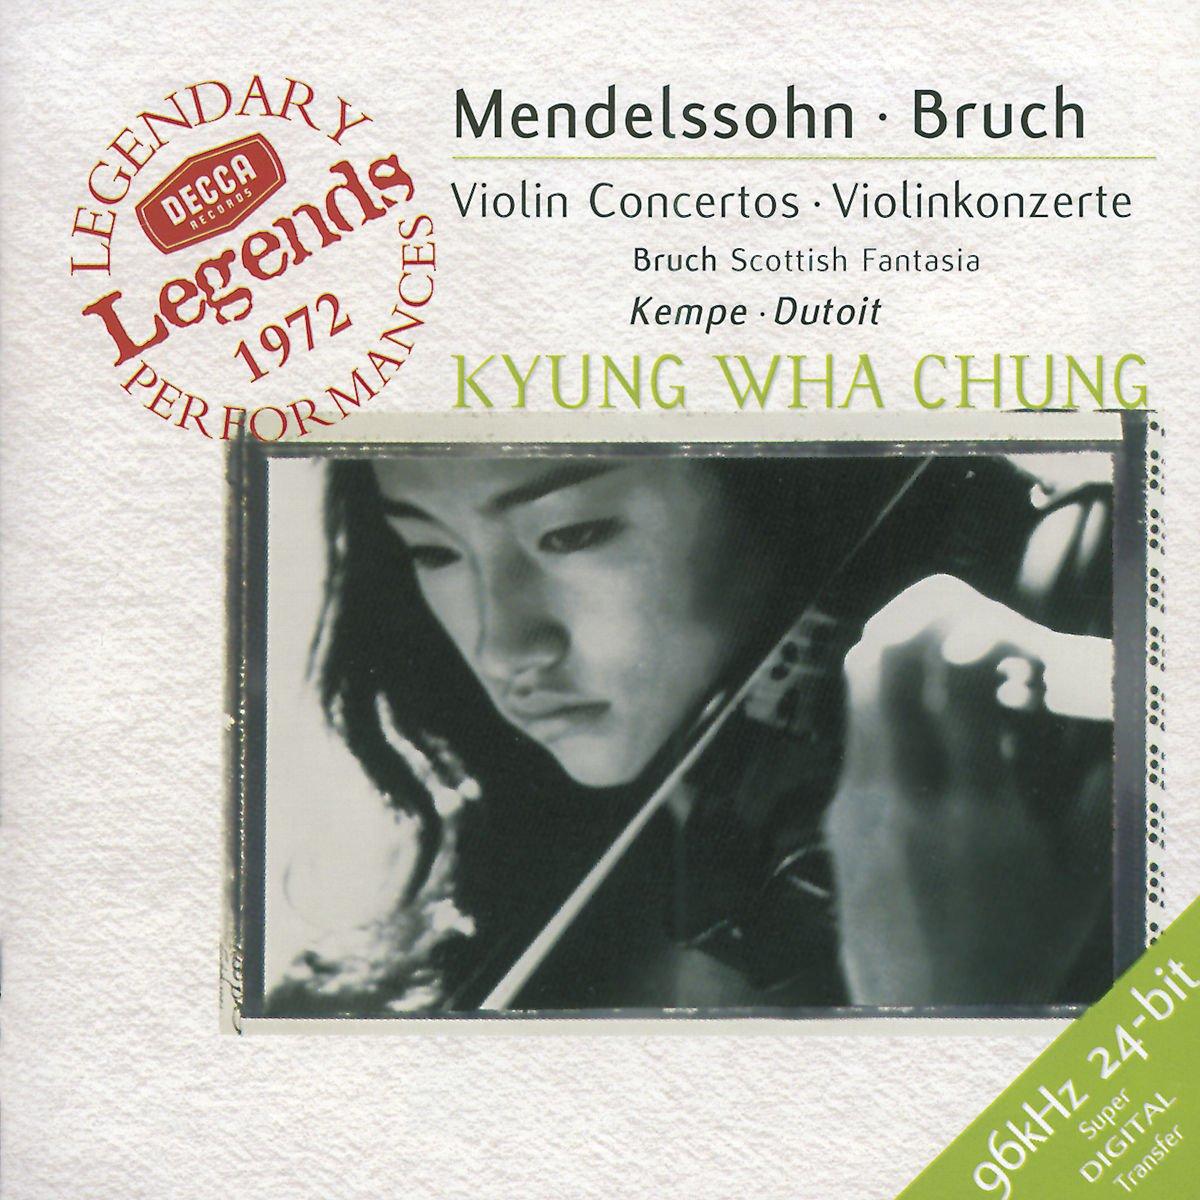 Mendelssohn, Bruch: Violin Concertos by CHUNG/DUTOIT/KEMPE